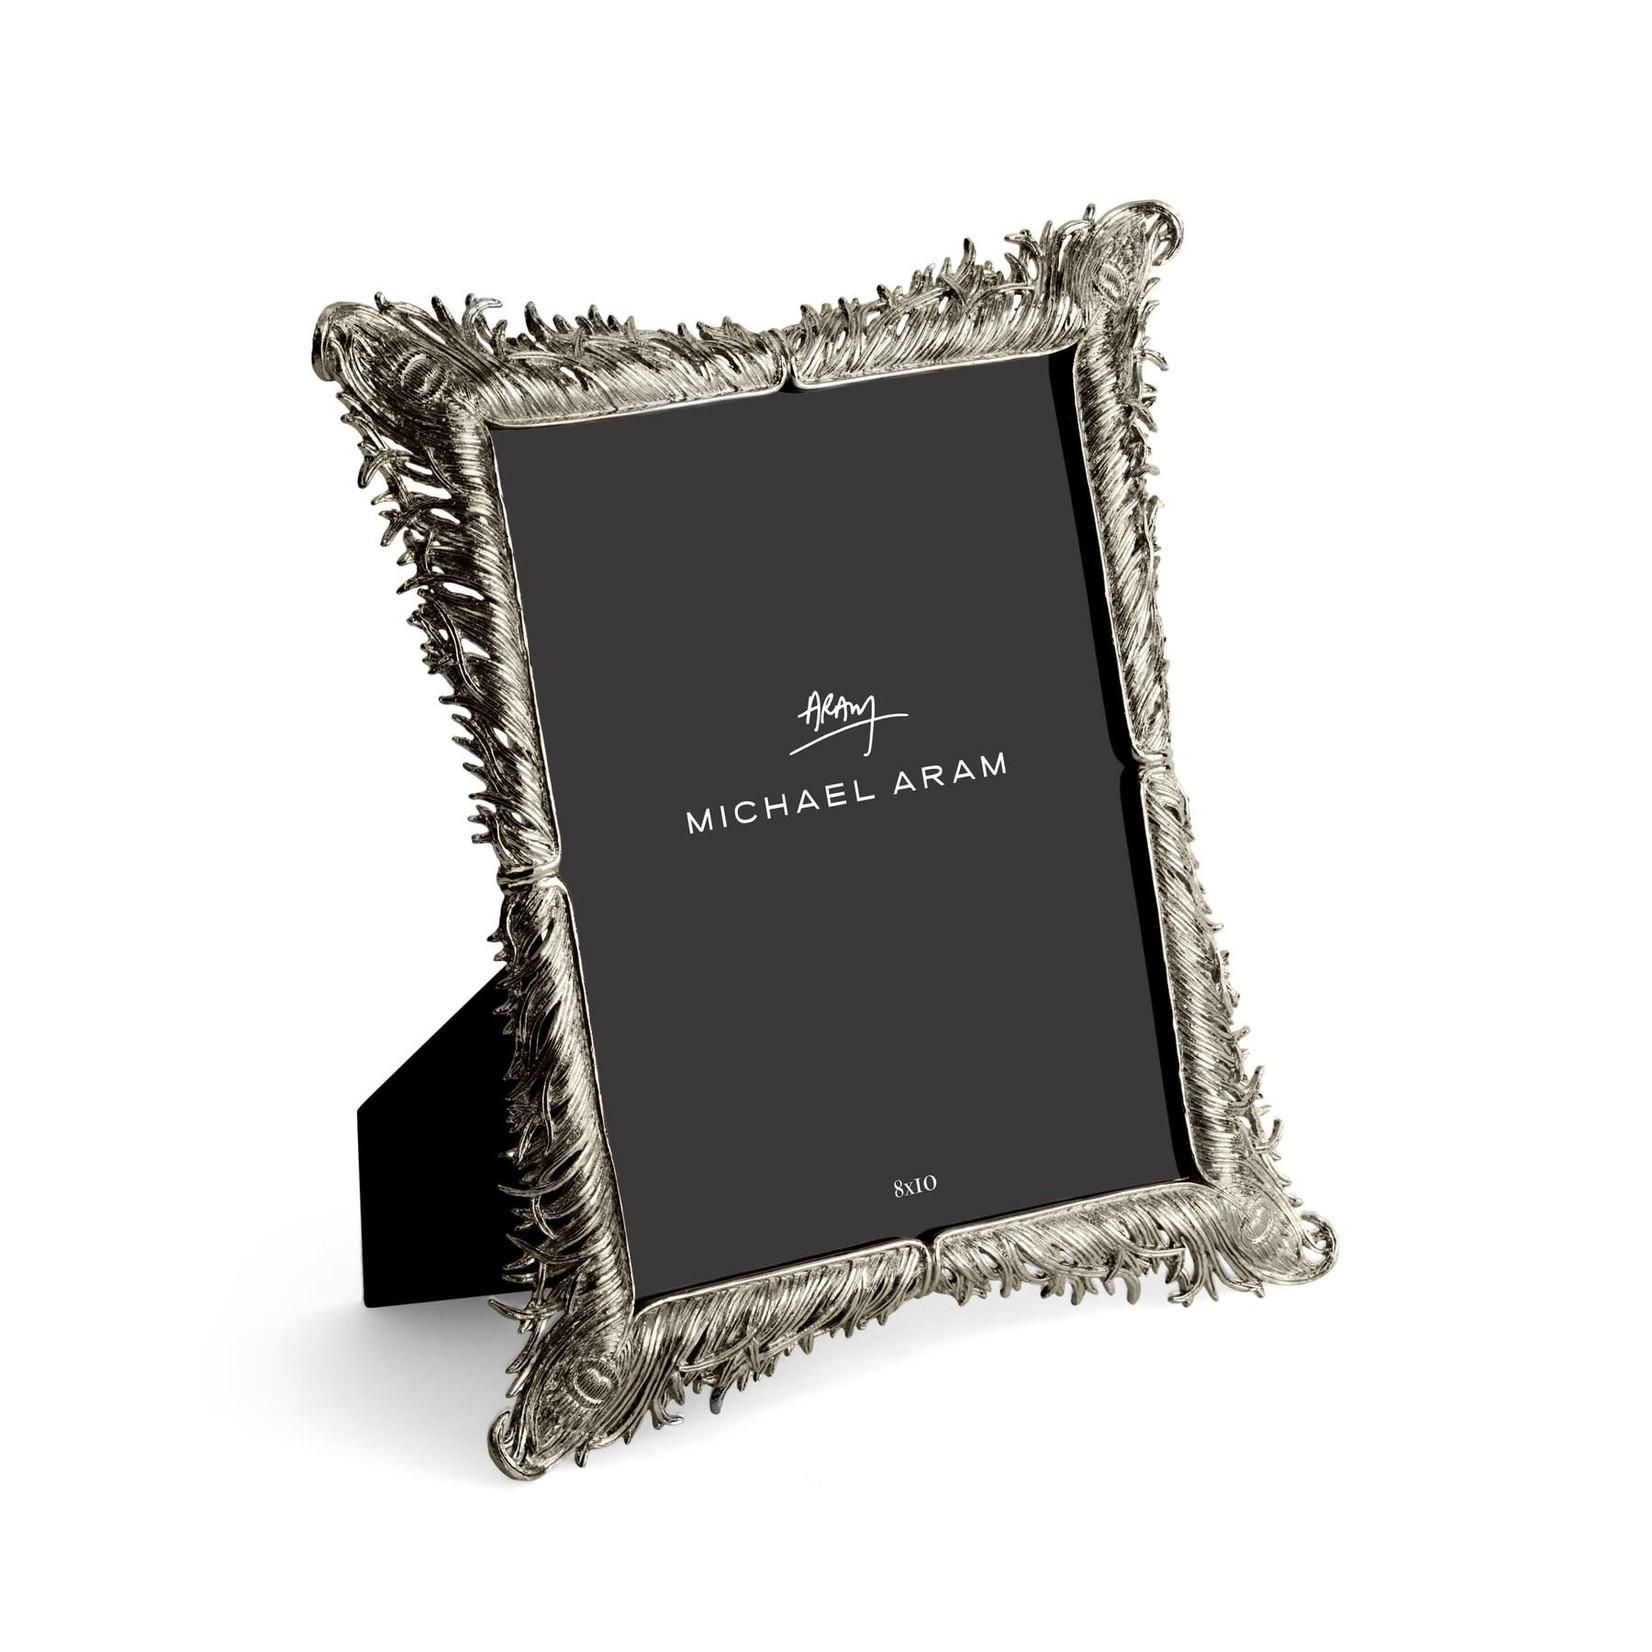 Michael Aram Plume Black 8x10 Frame